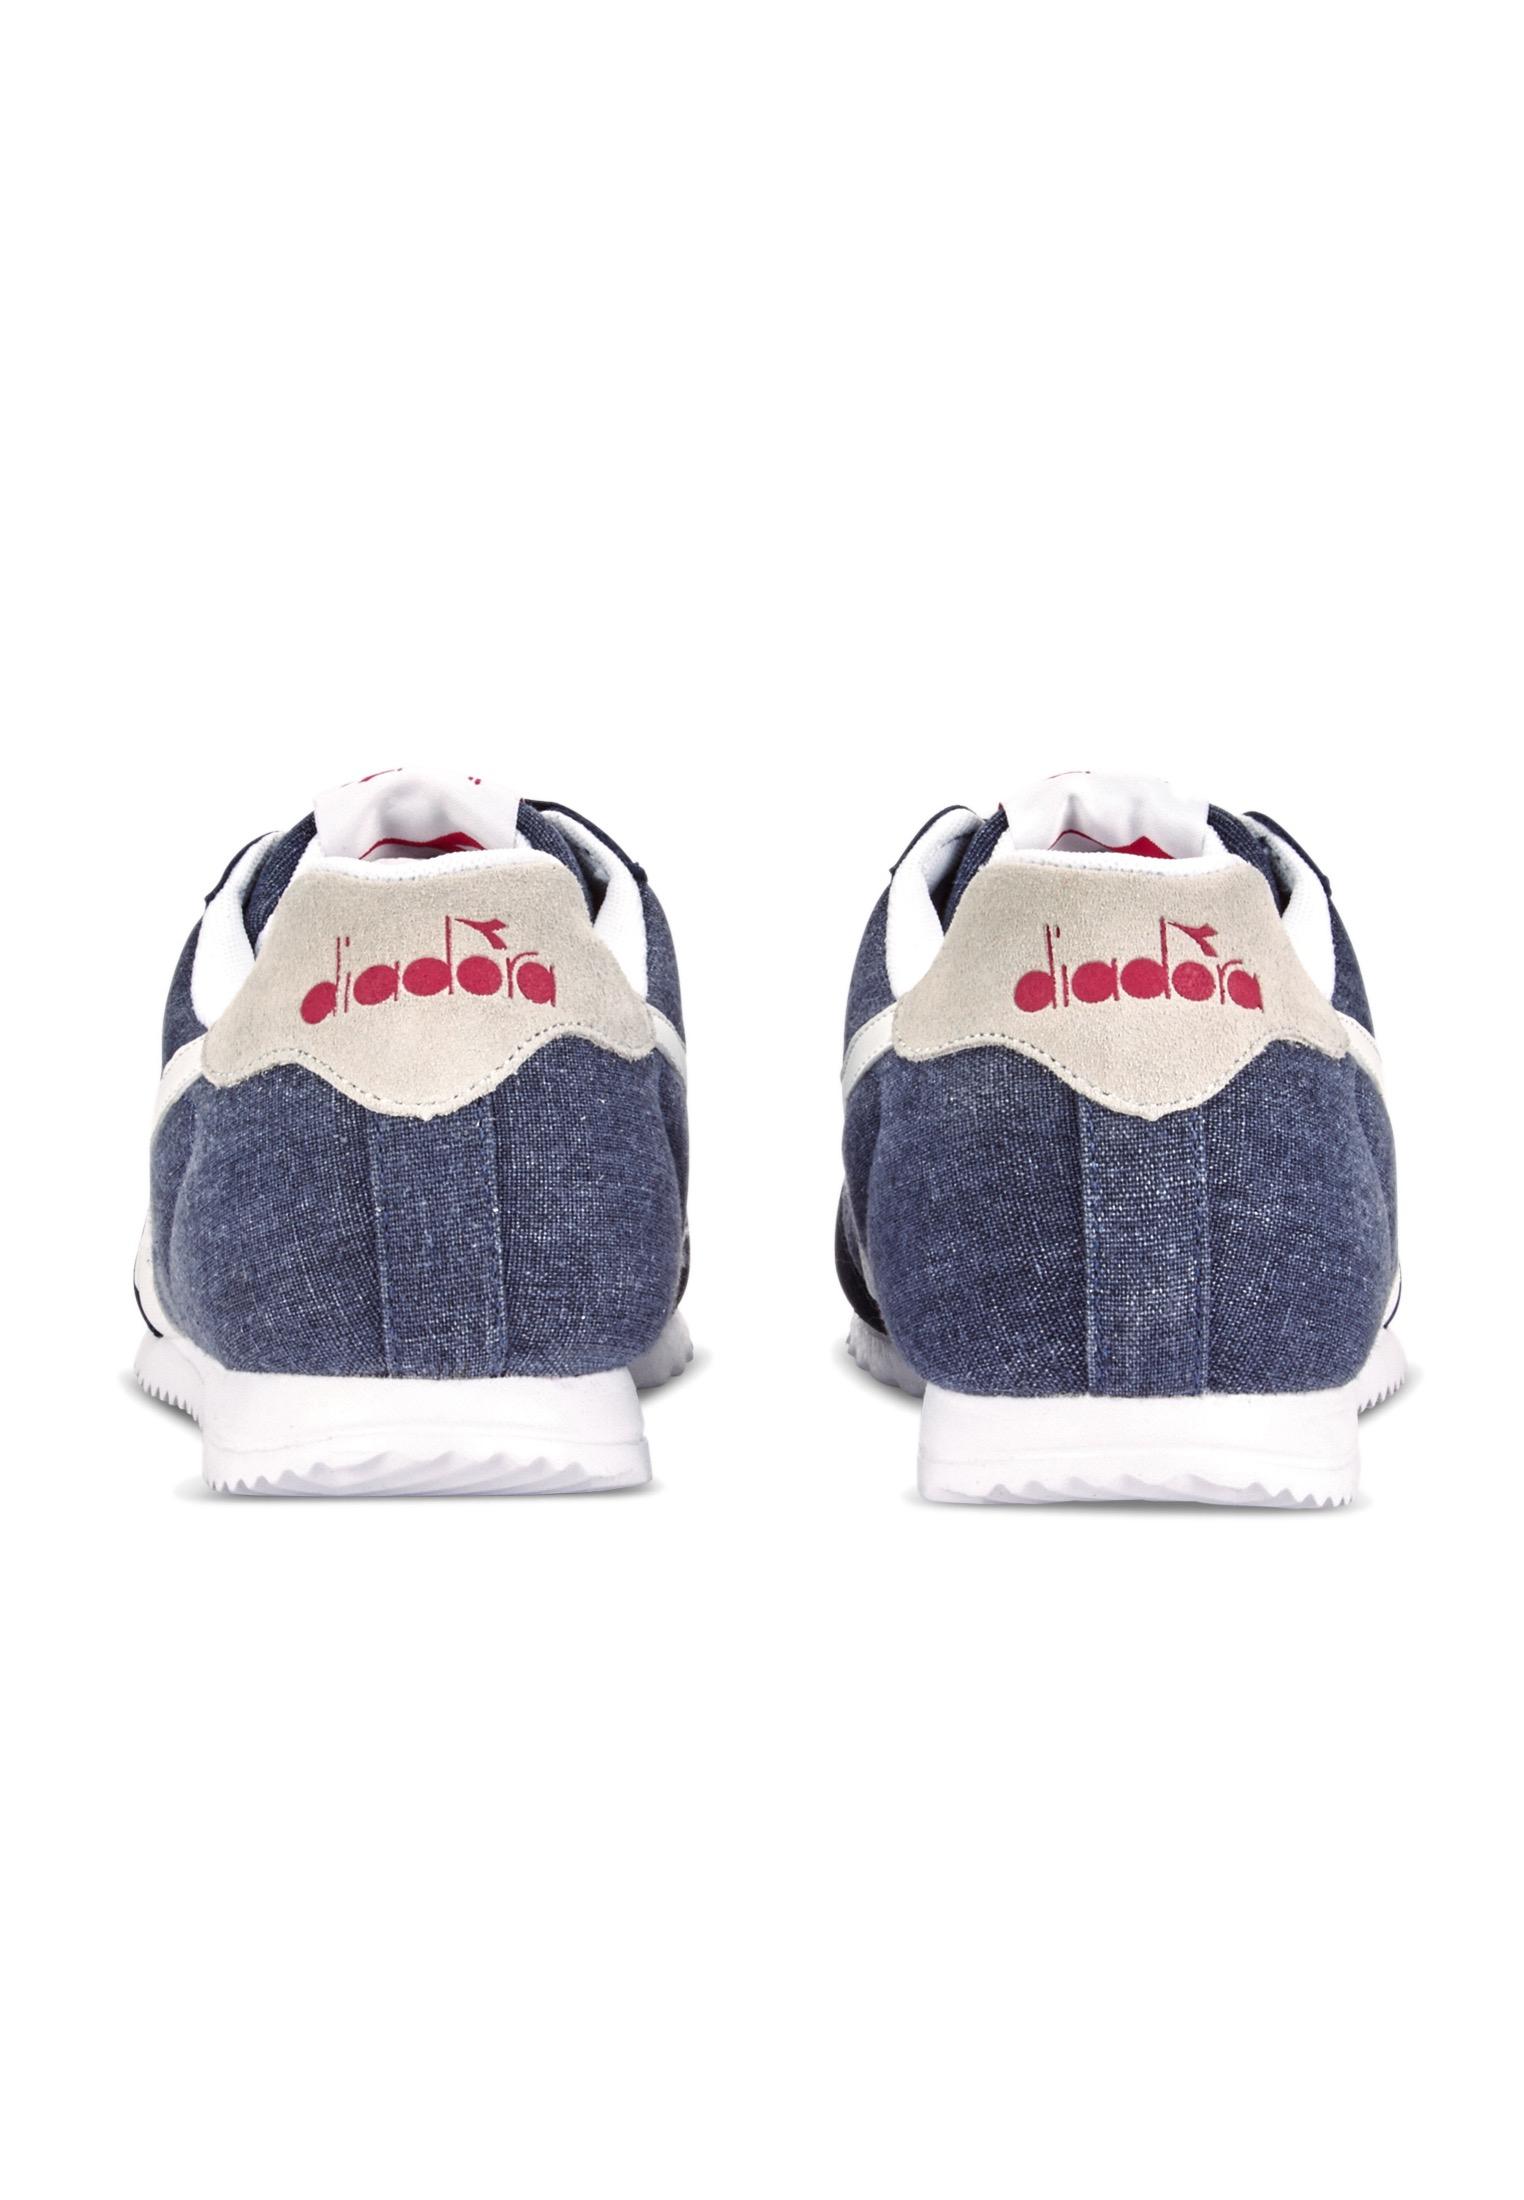 Scarpe-Diadora-Jog-Light-C-Sneakers-sportive-uomo-donna-vari-colori-e-taglie miniatura 24